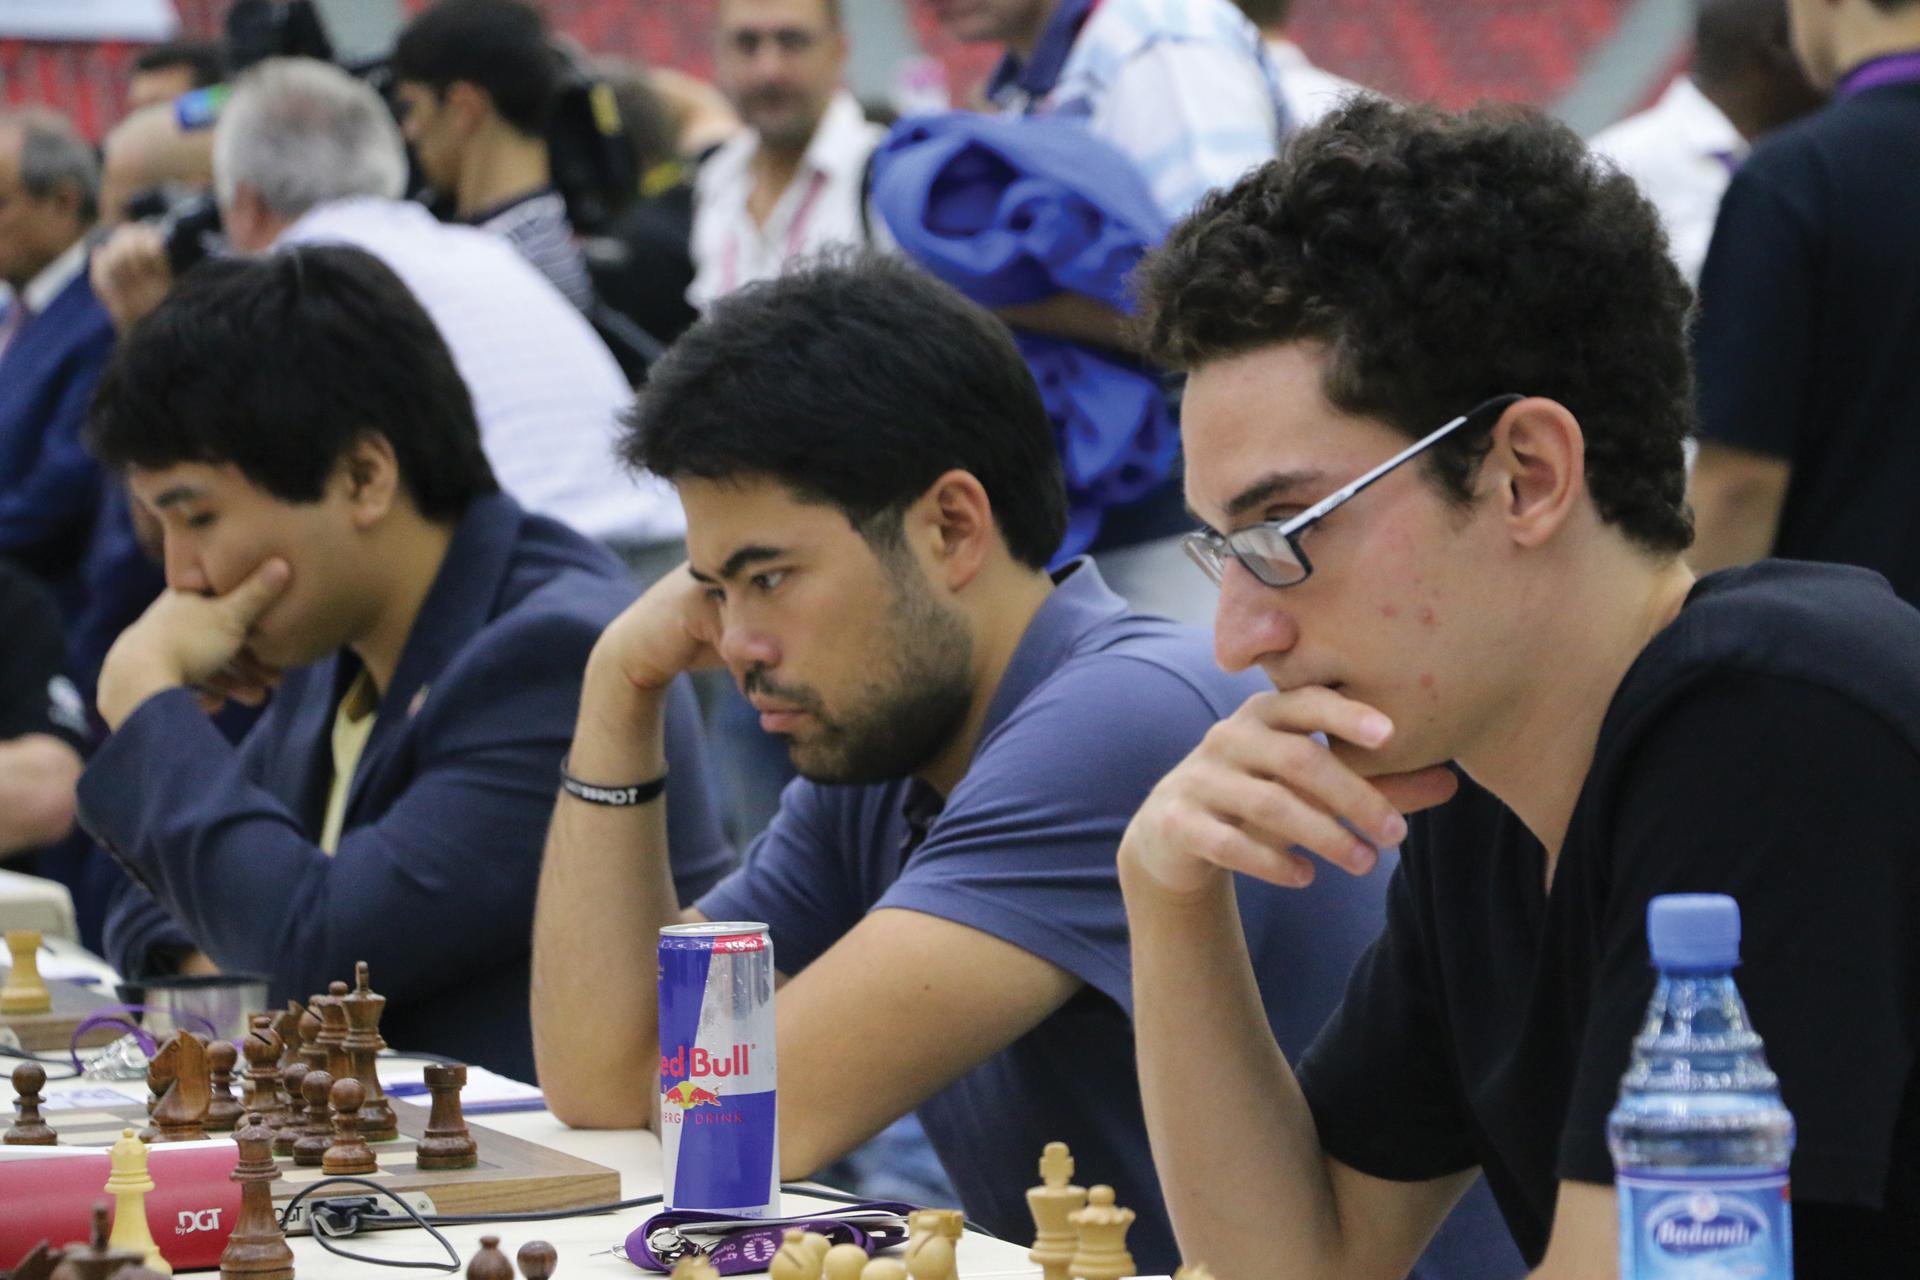 GMs Wesley So, Hikaru Nakamura, and Fabiano Caruana Compete in the 2016 Baku, Azerbaijan, Chess Olympiad